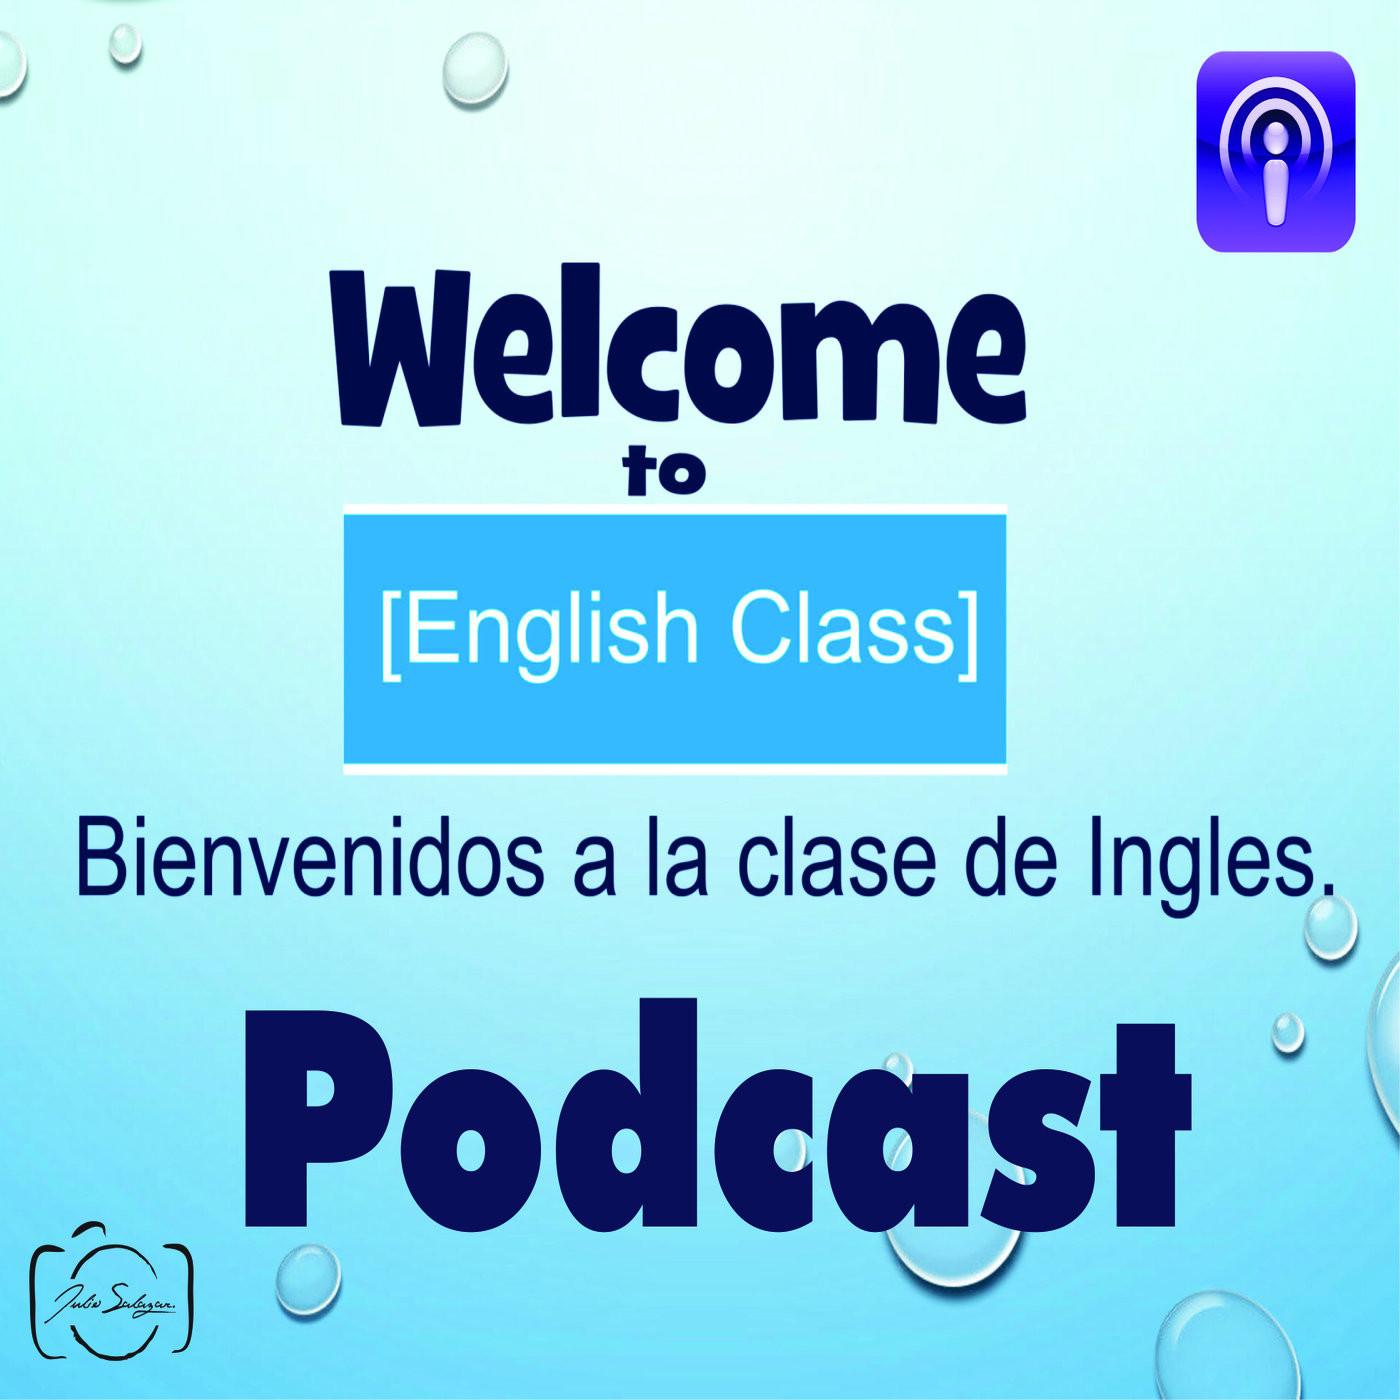 <![CDATA[English Class]]>